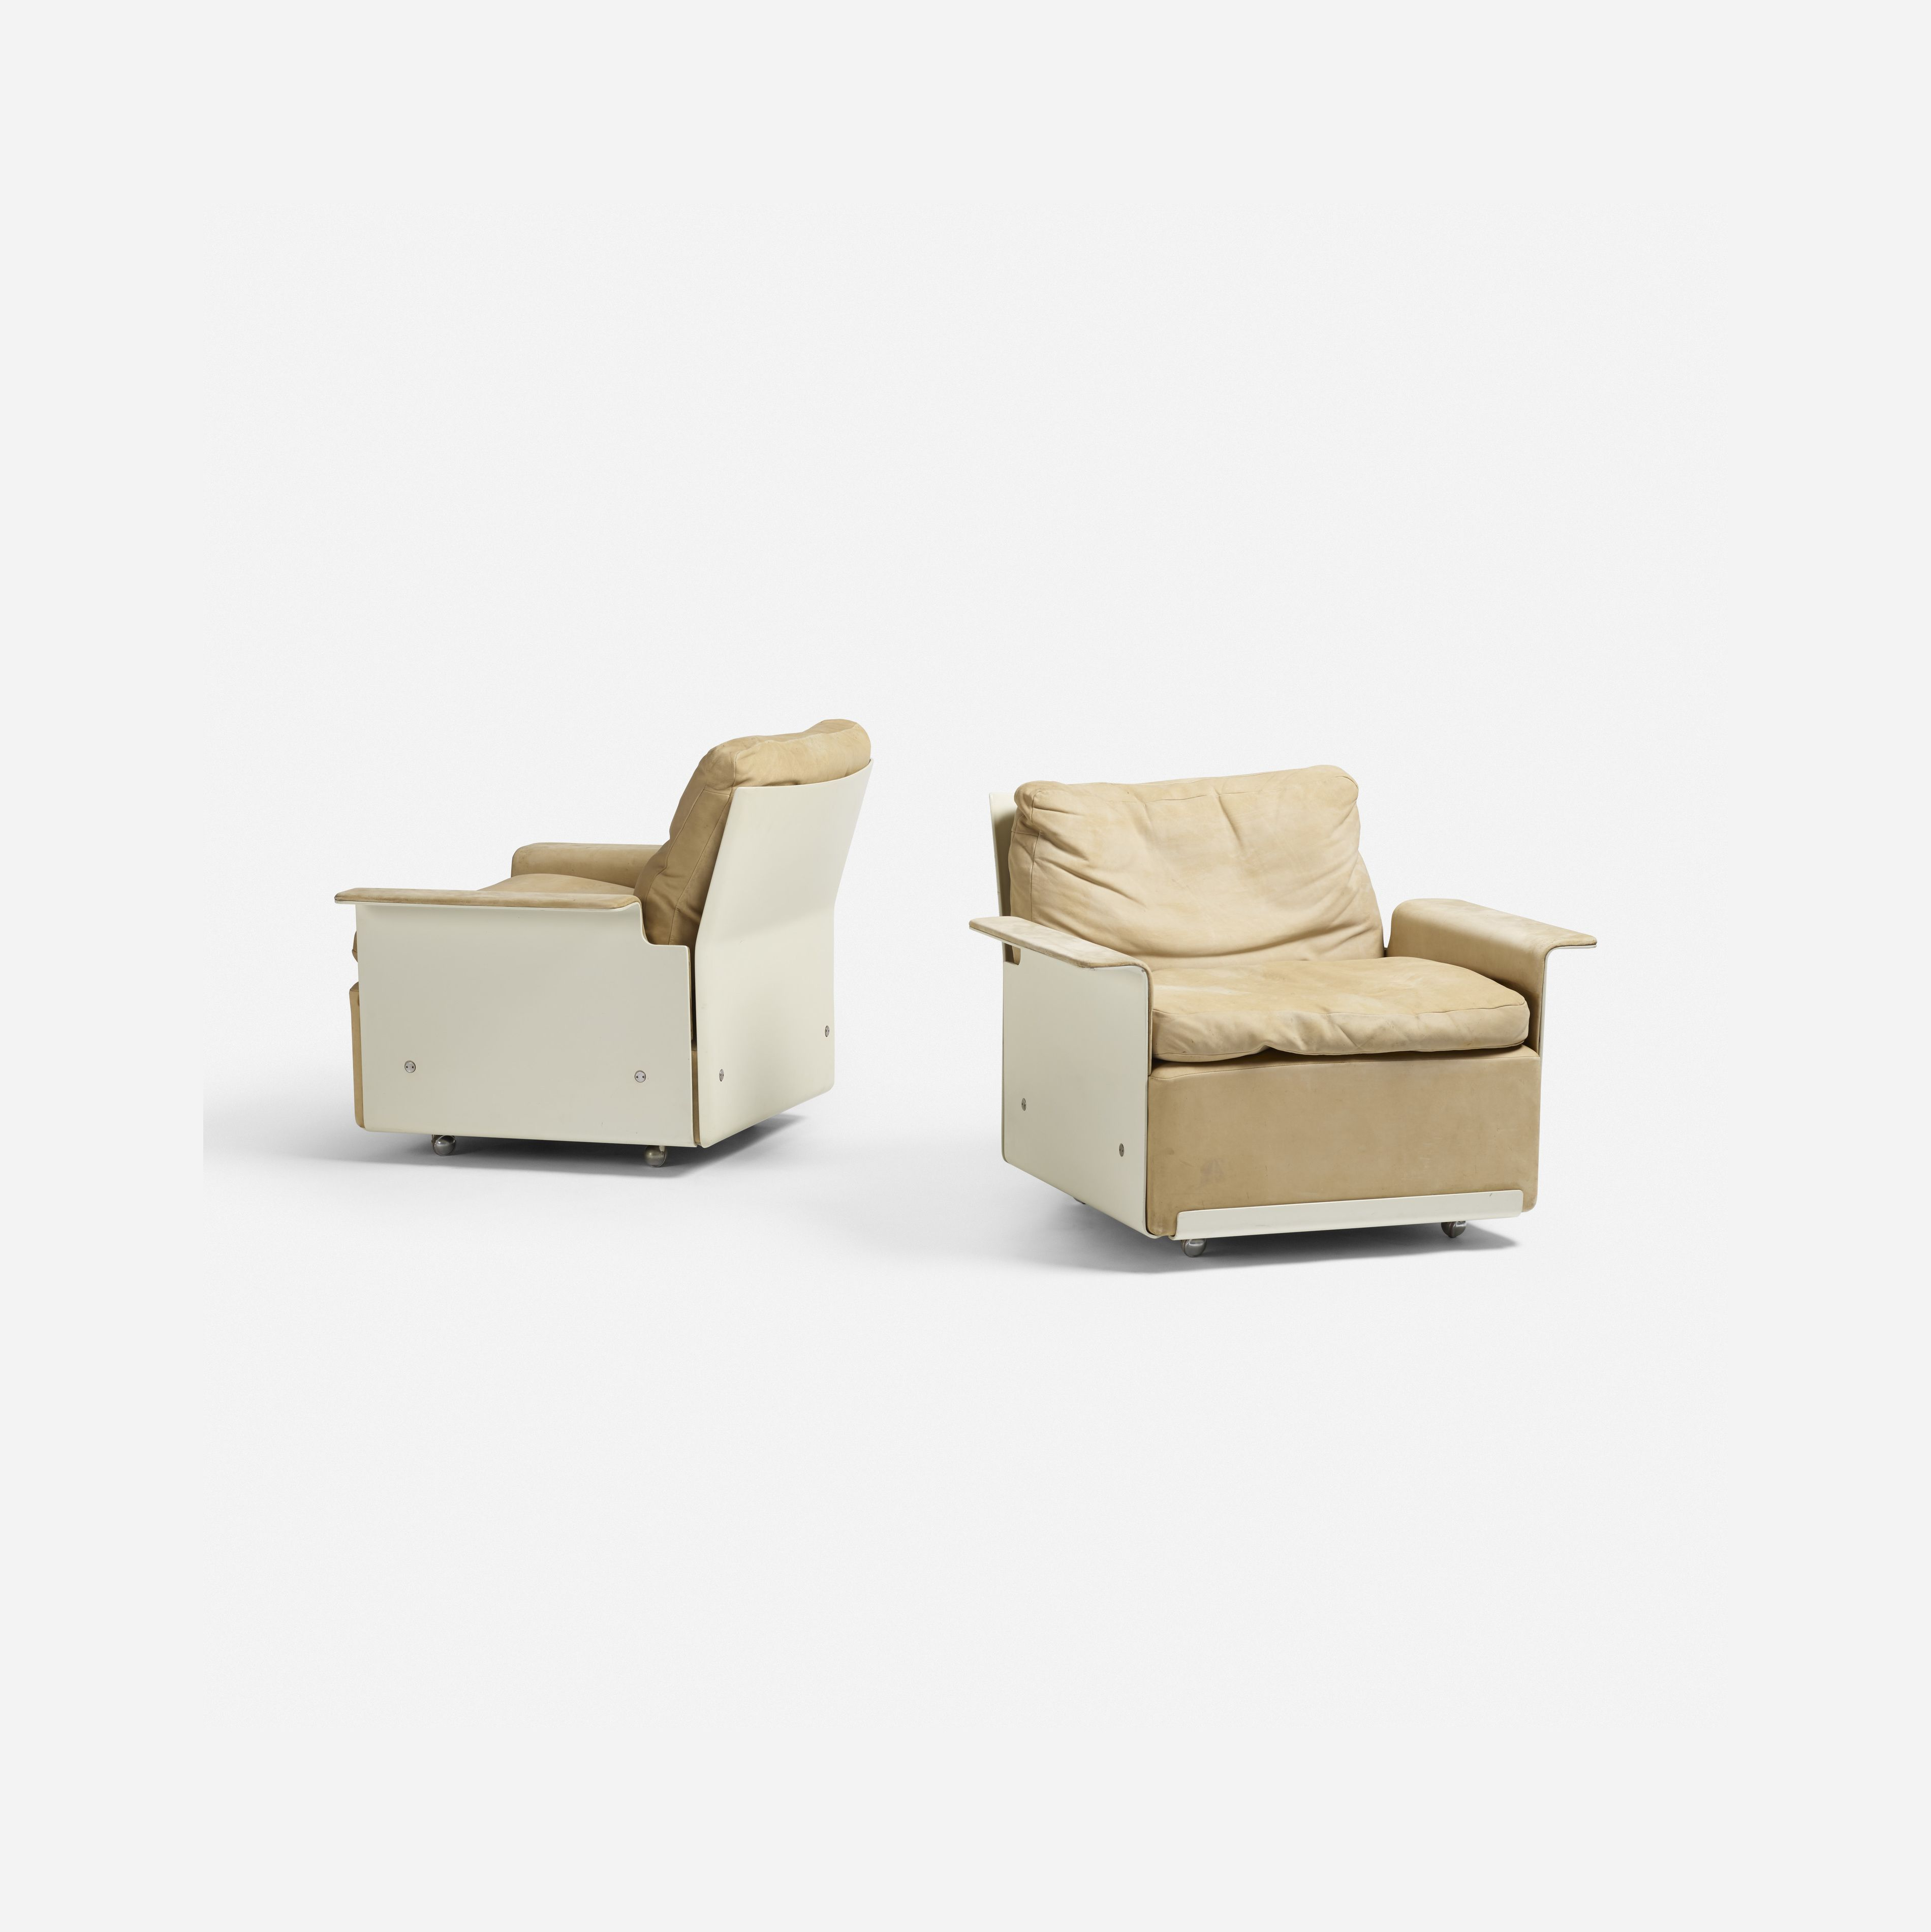 Miraculous 180 Dieter Rams First Generation 620 Lounge Chairs Pair Creativecarmelina Interior Chair Design Creativecarmelinacom